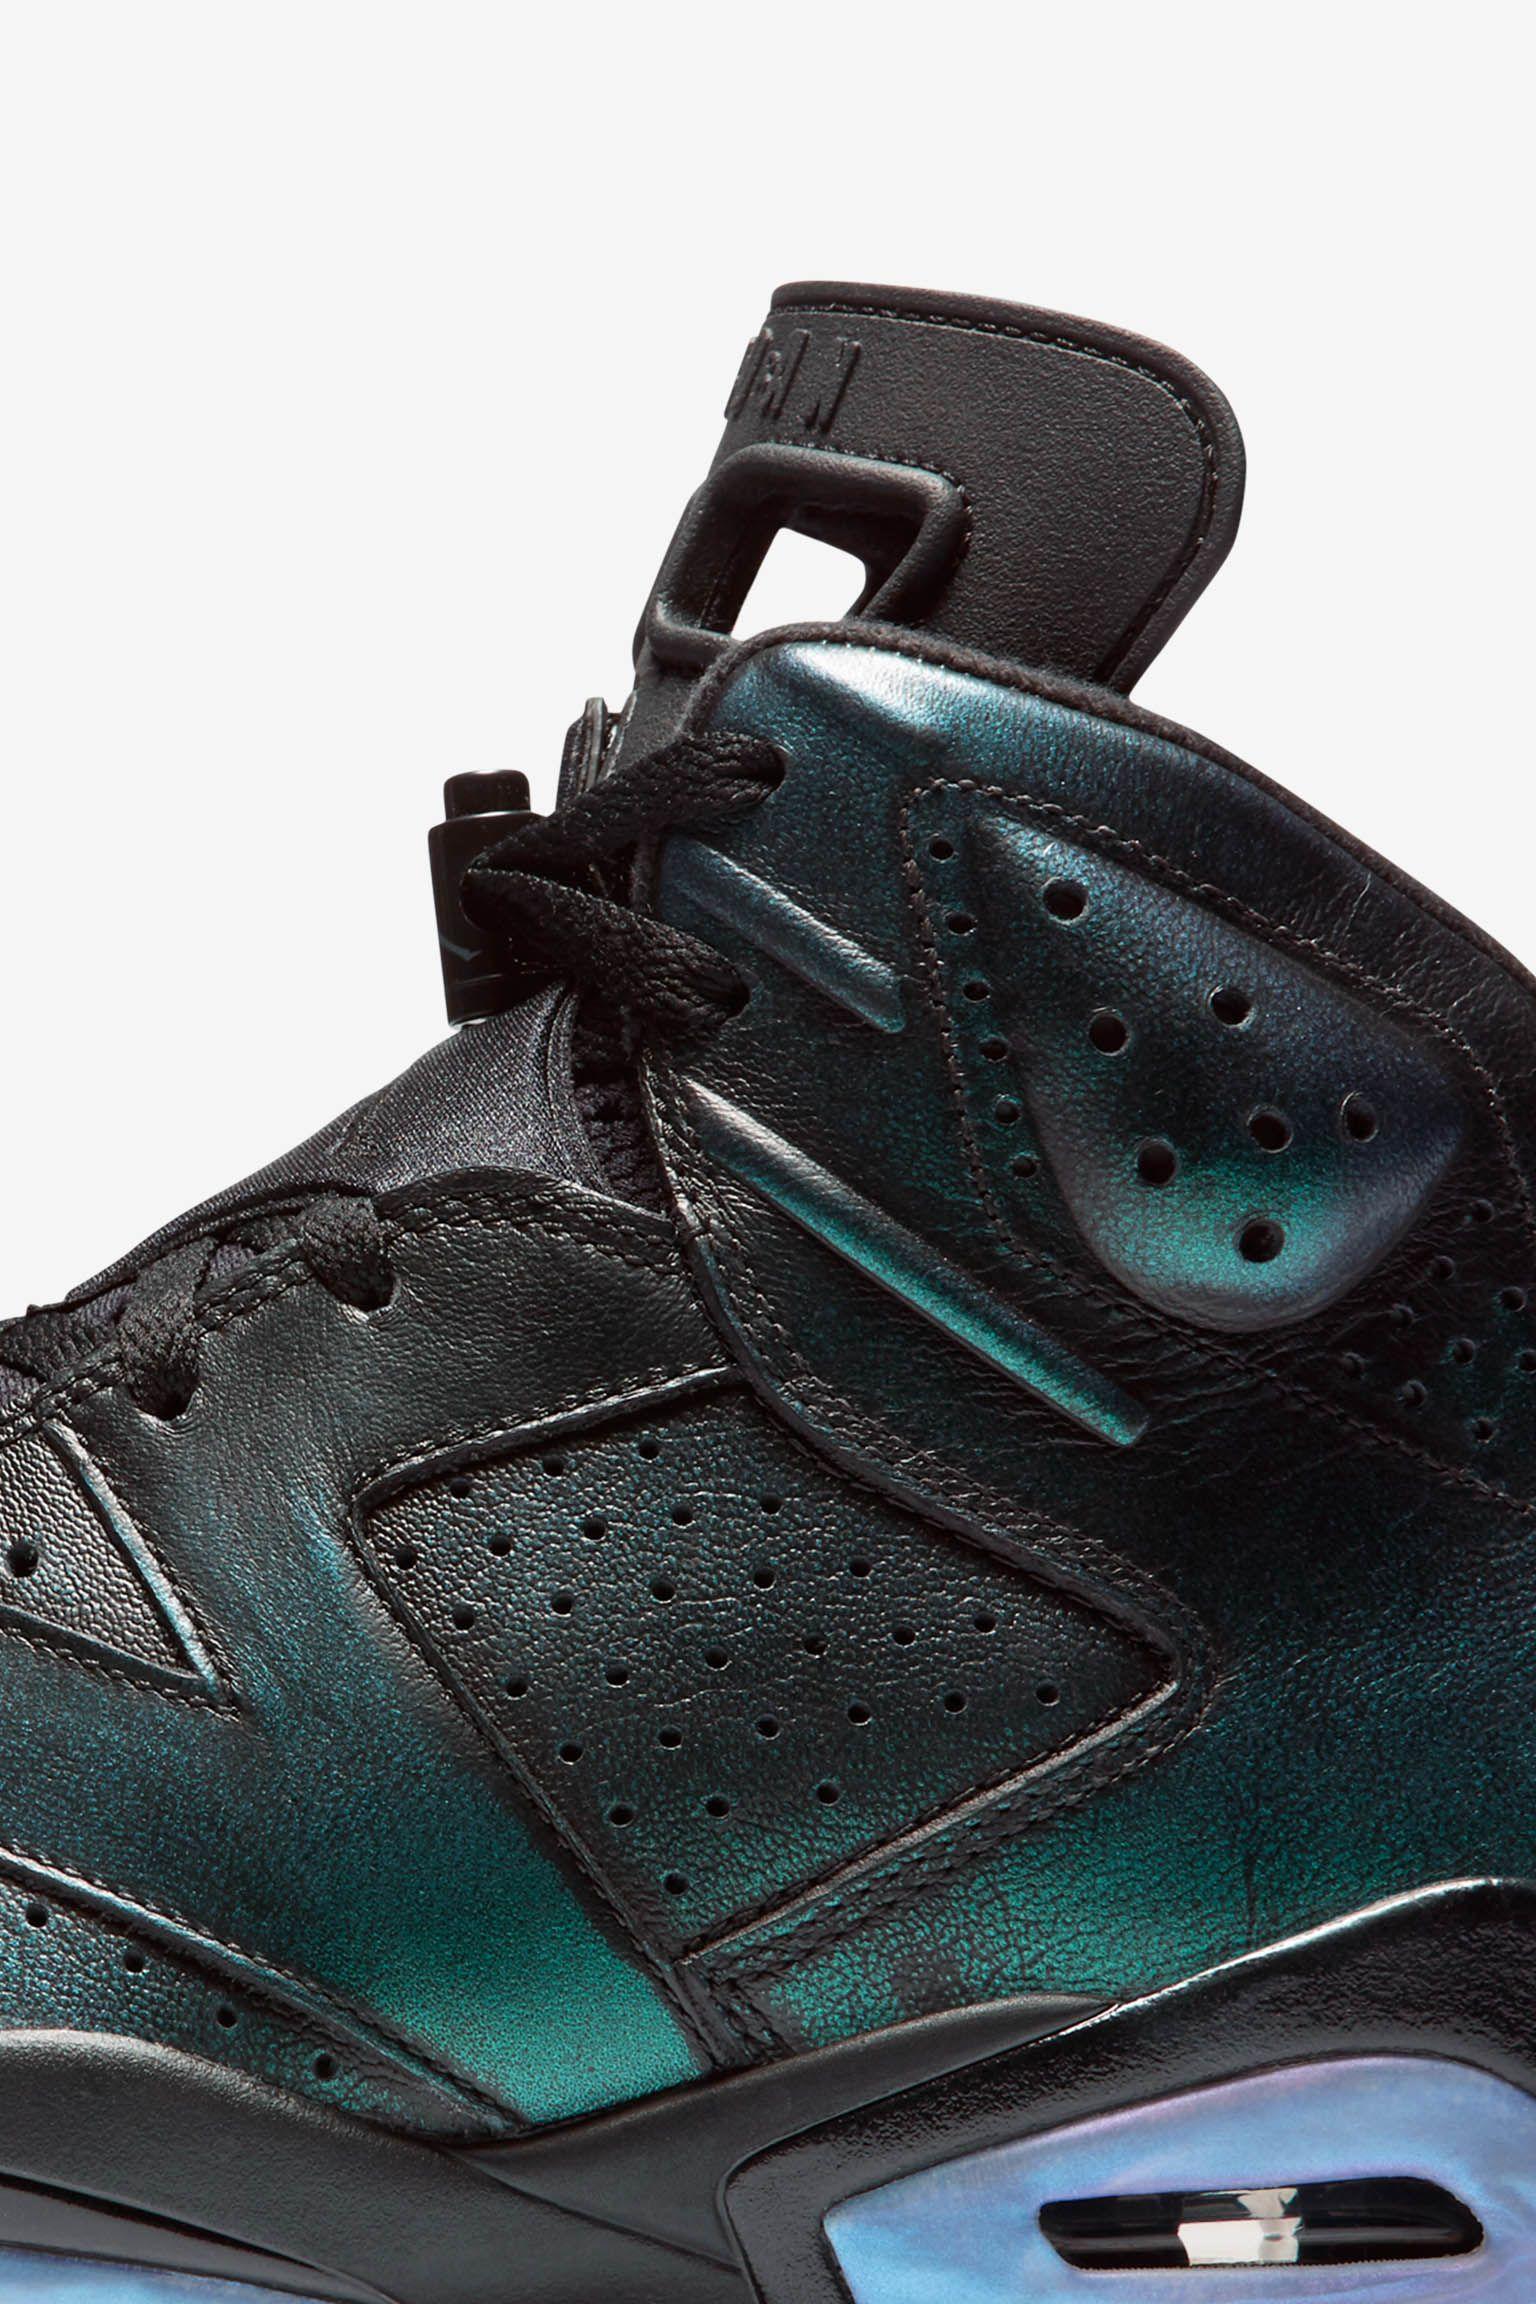 Air Jordan 6 Retro 'Gotta Shine'